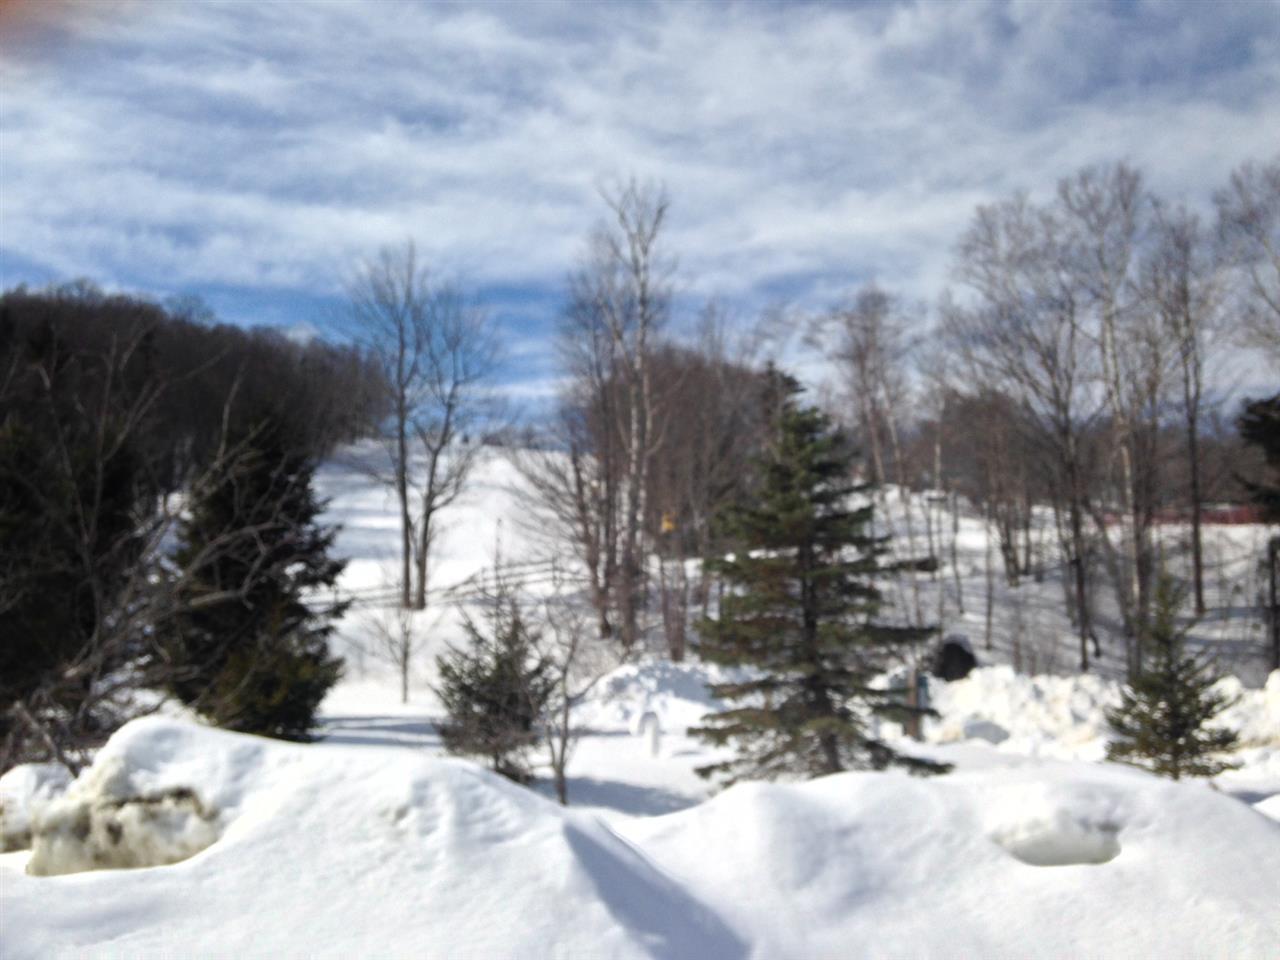 Mount-Snow-Real-Estate-4465115-4